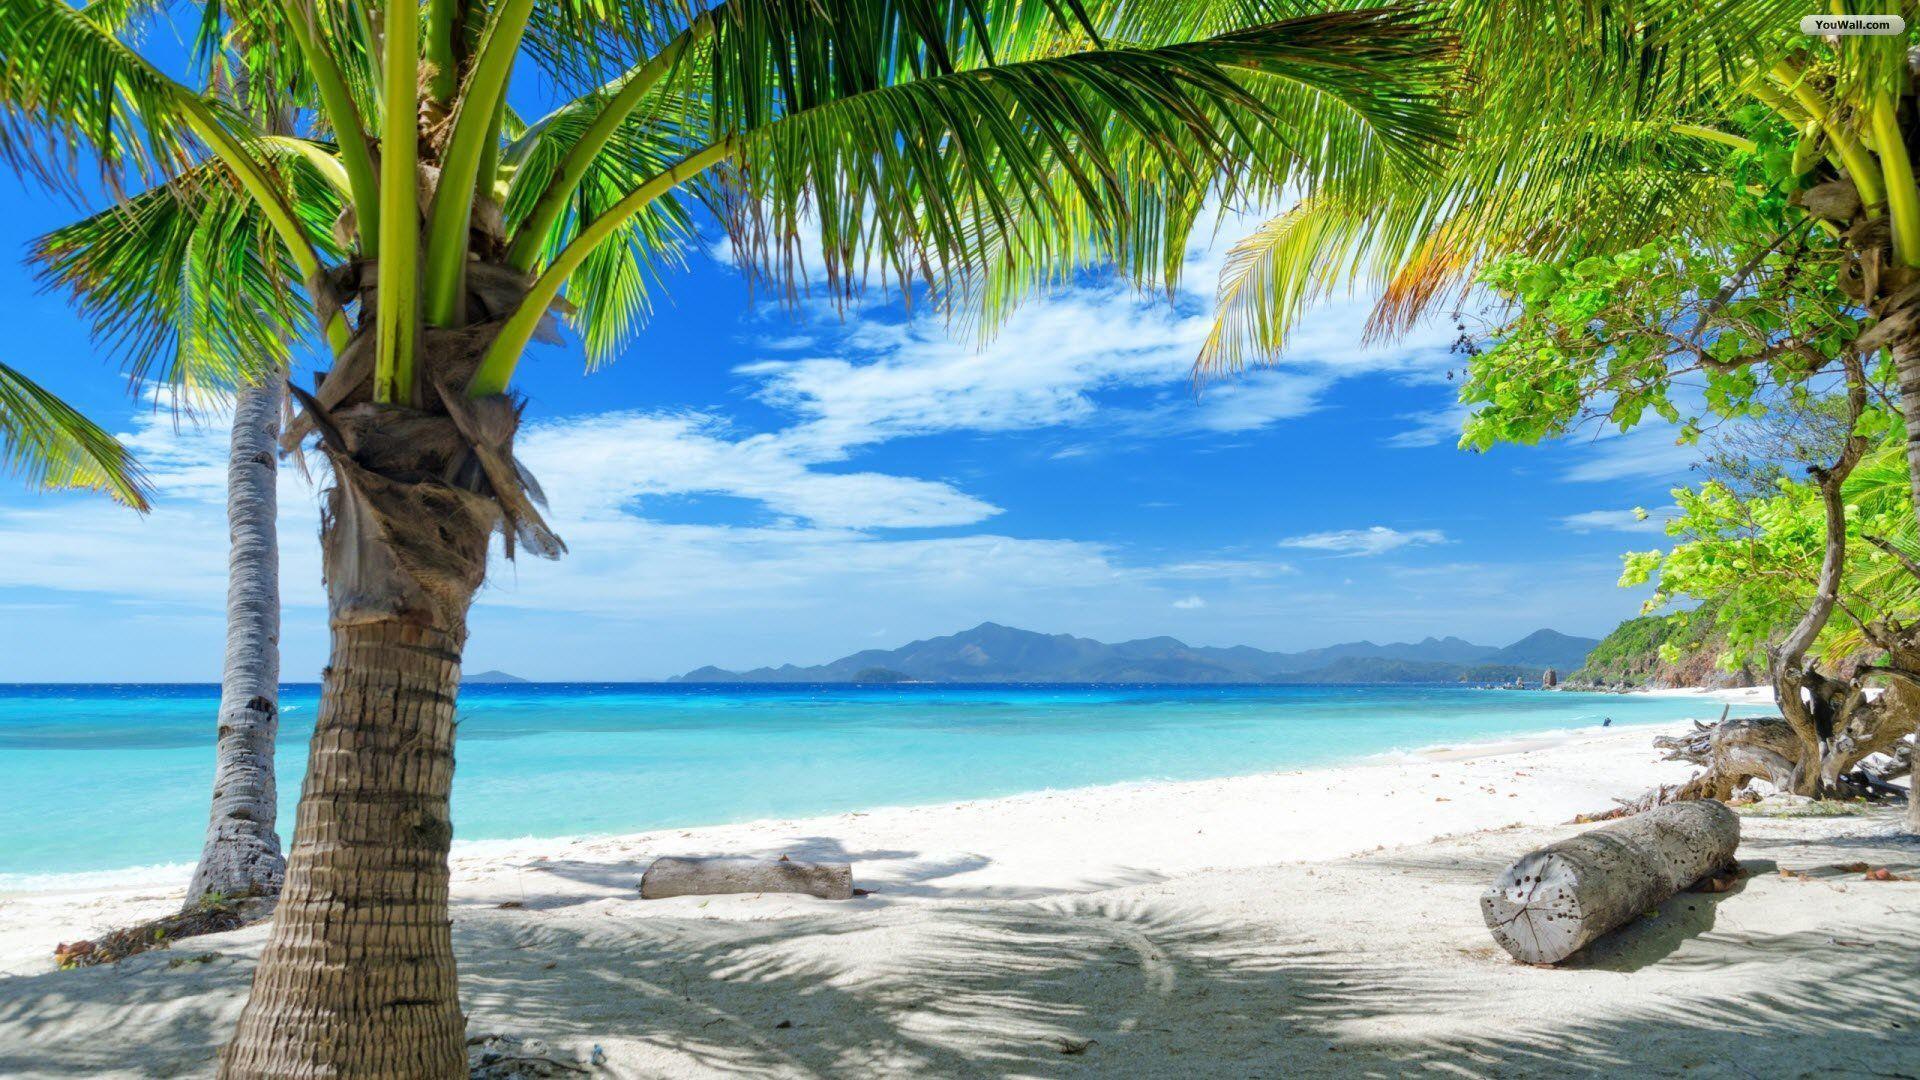 Paradise Beach Desktop Wallpaper